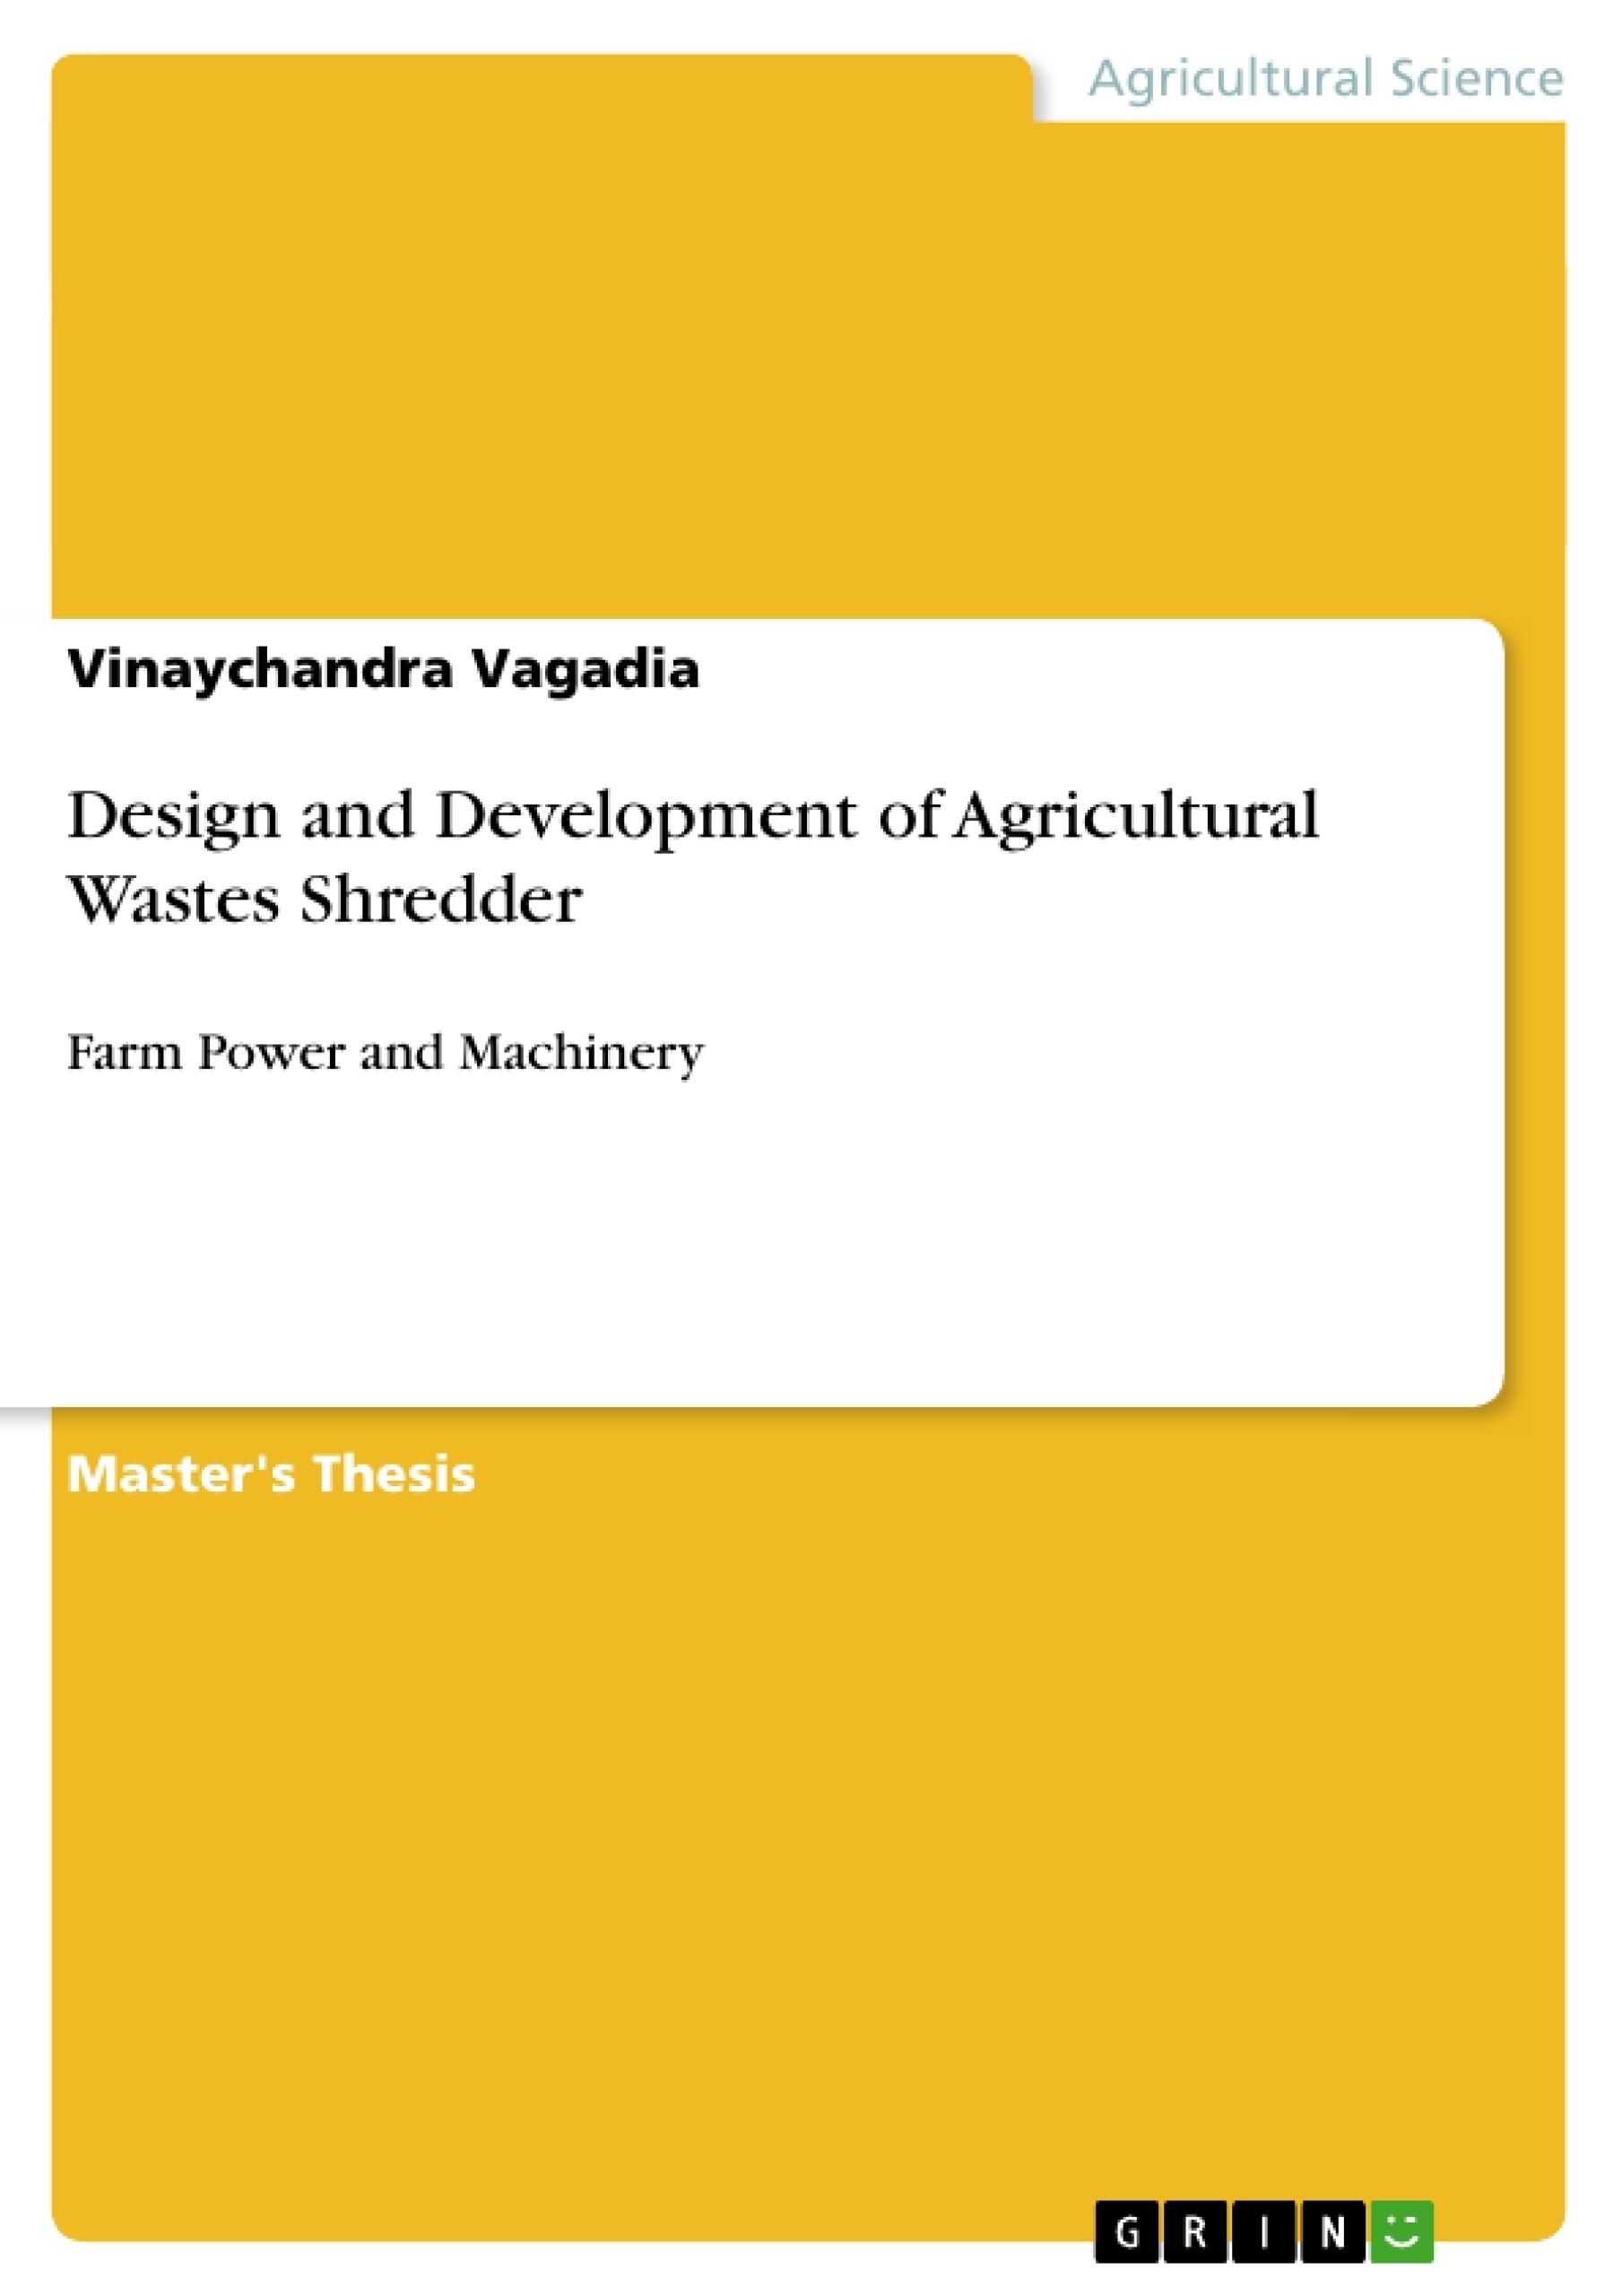 Title: Design and Development of Agricultural Wastes Shredder